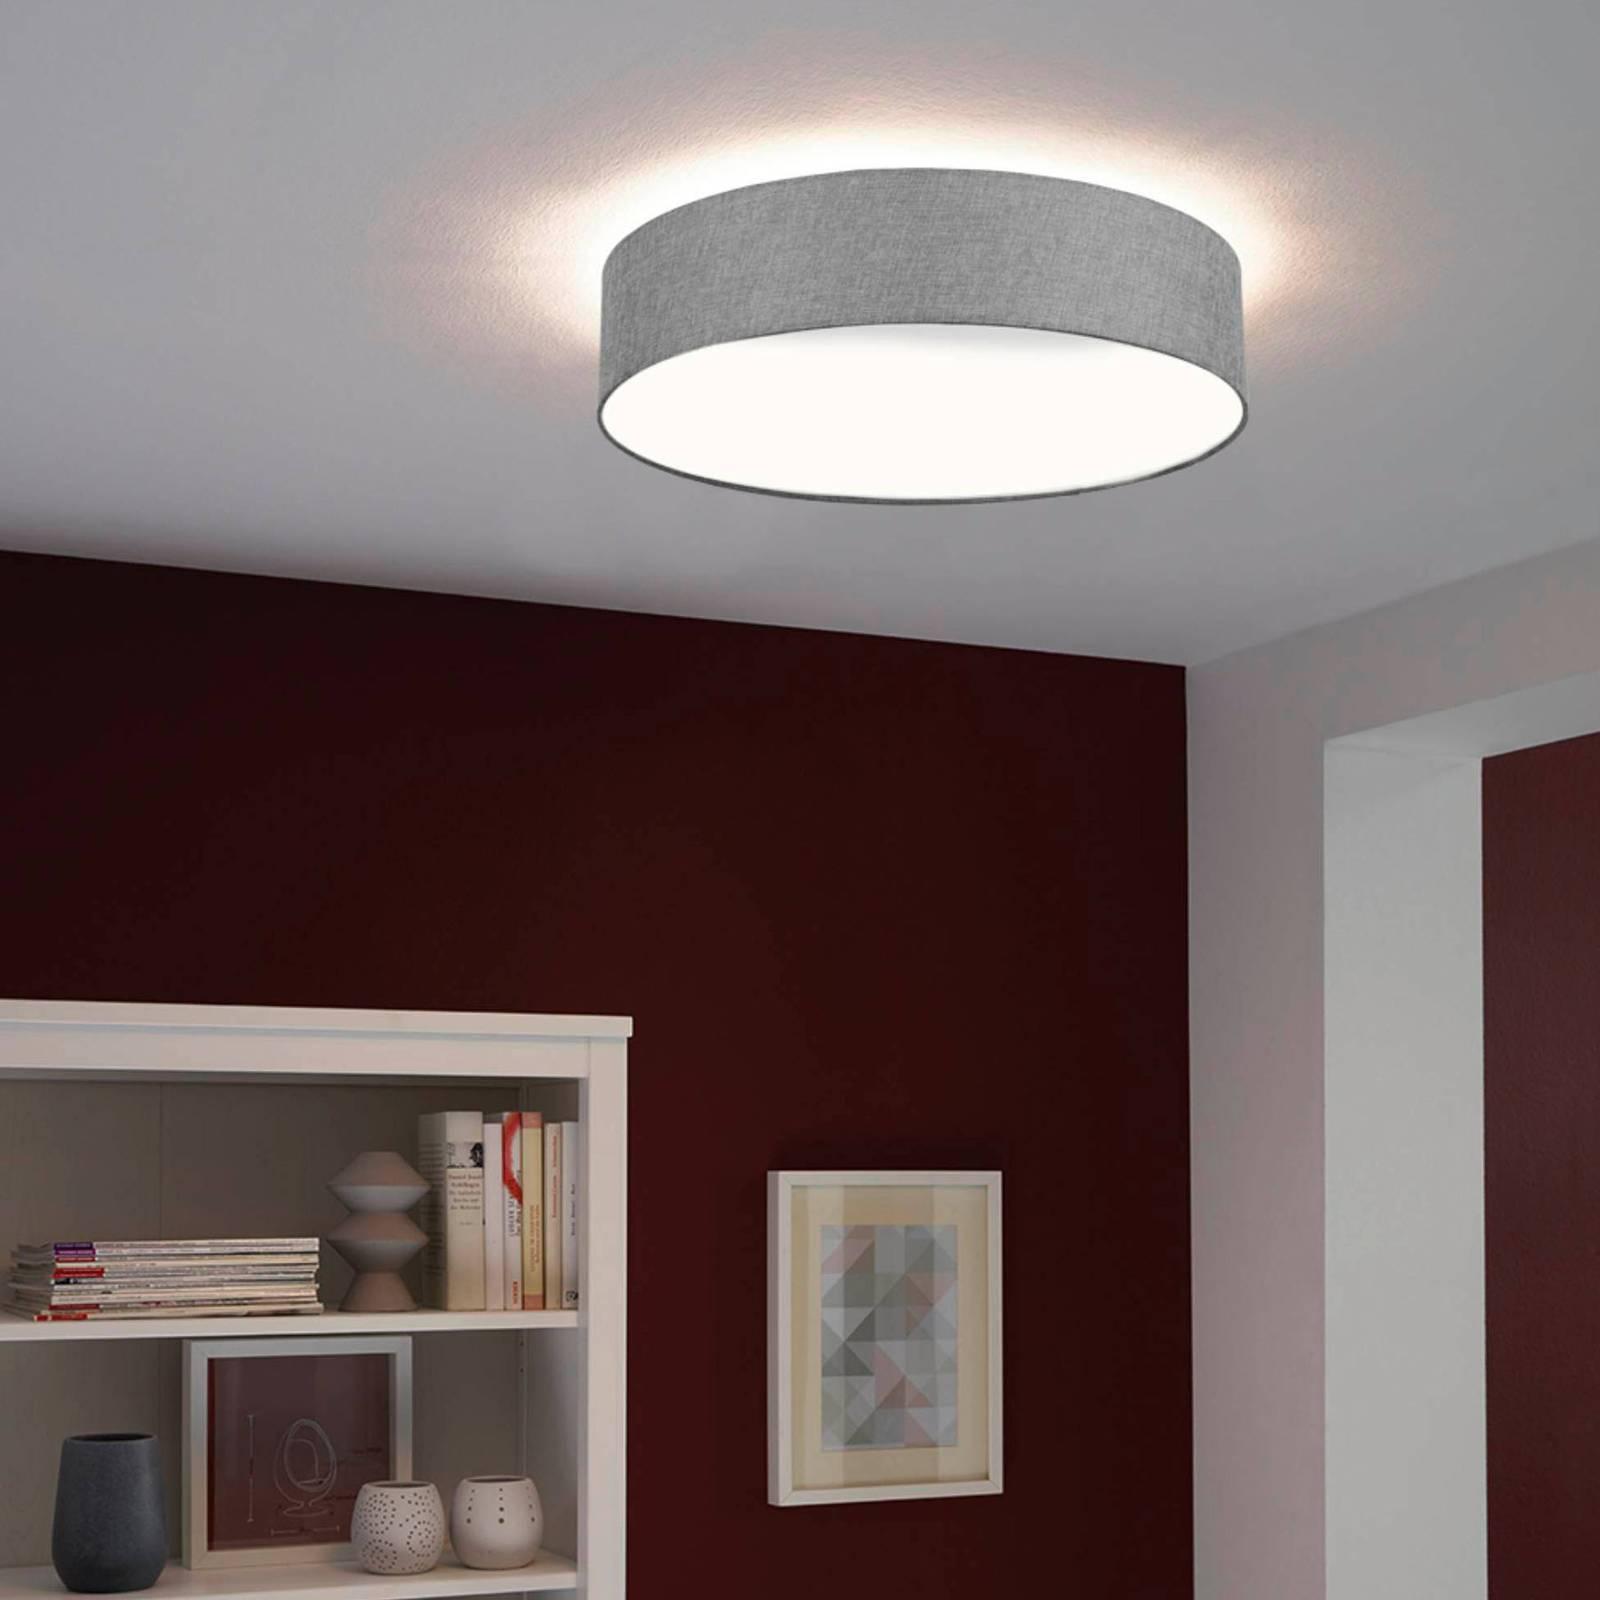 EGLO connect Ramao-C lampa sufitowa LED szara 57cm